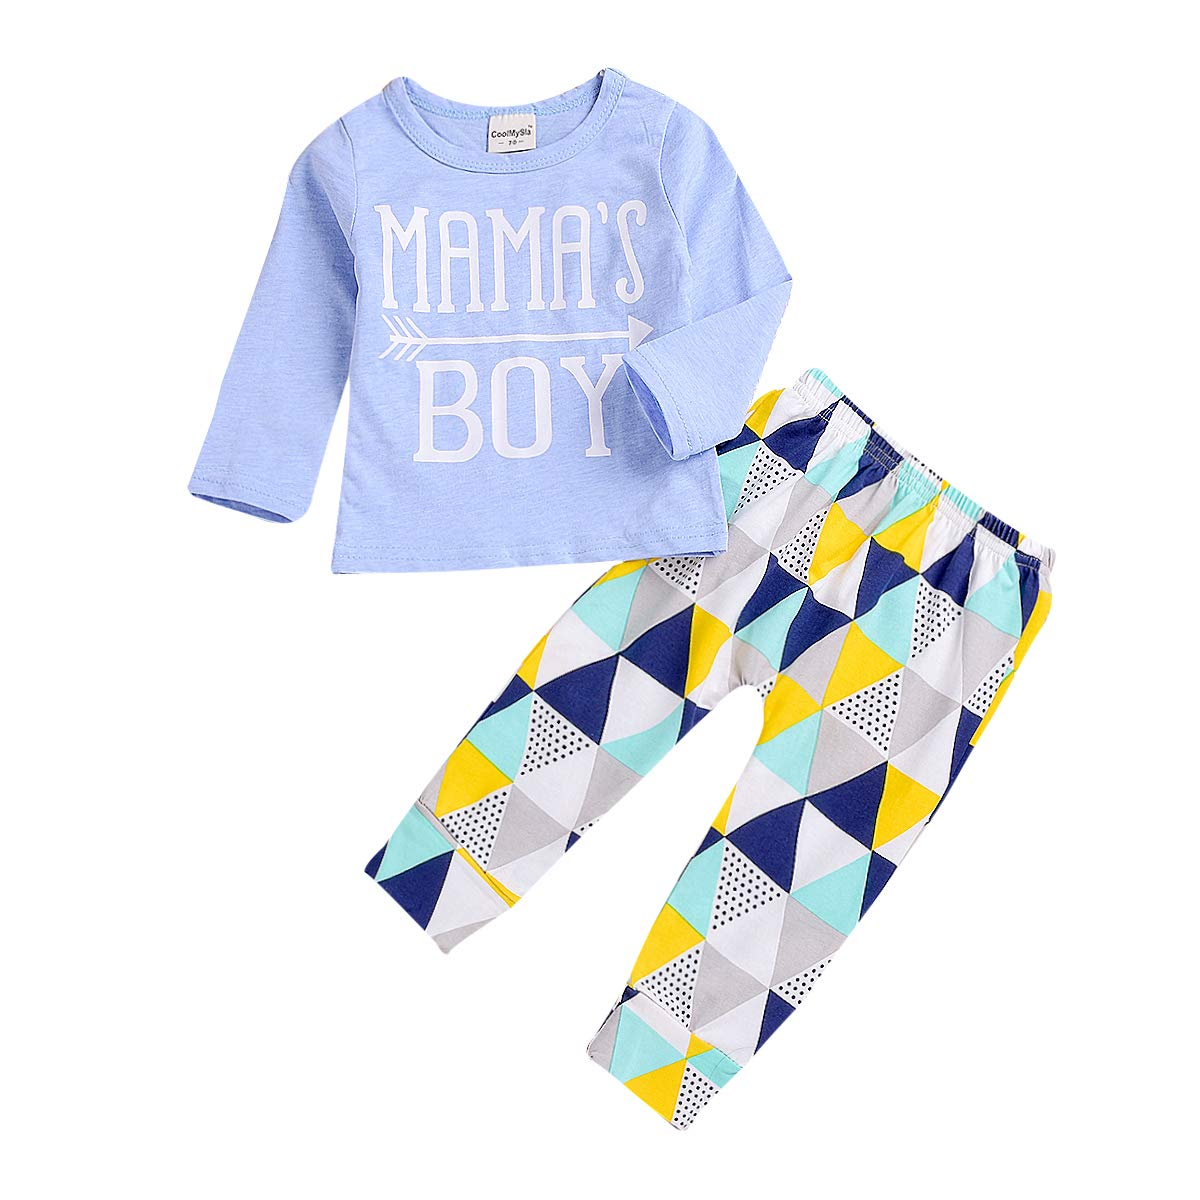 Baby Boys Summer Mama's Boy Long Sleeve T-Shirt Tops + Geometric Pants Clothes Set (Blue, 12-18 Months)